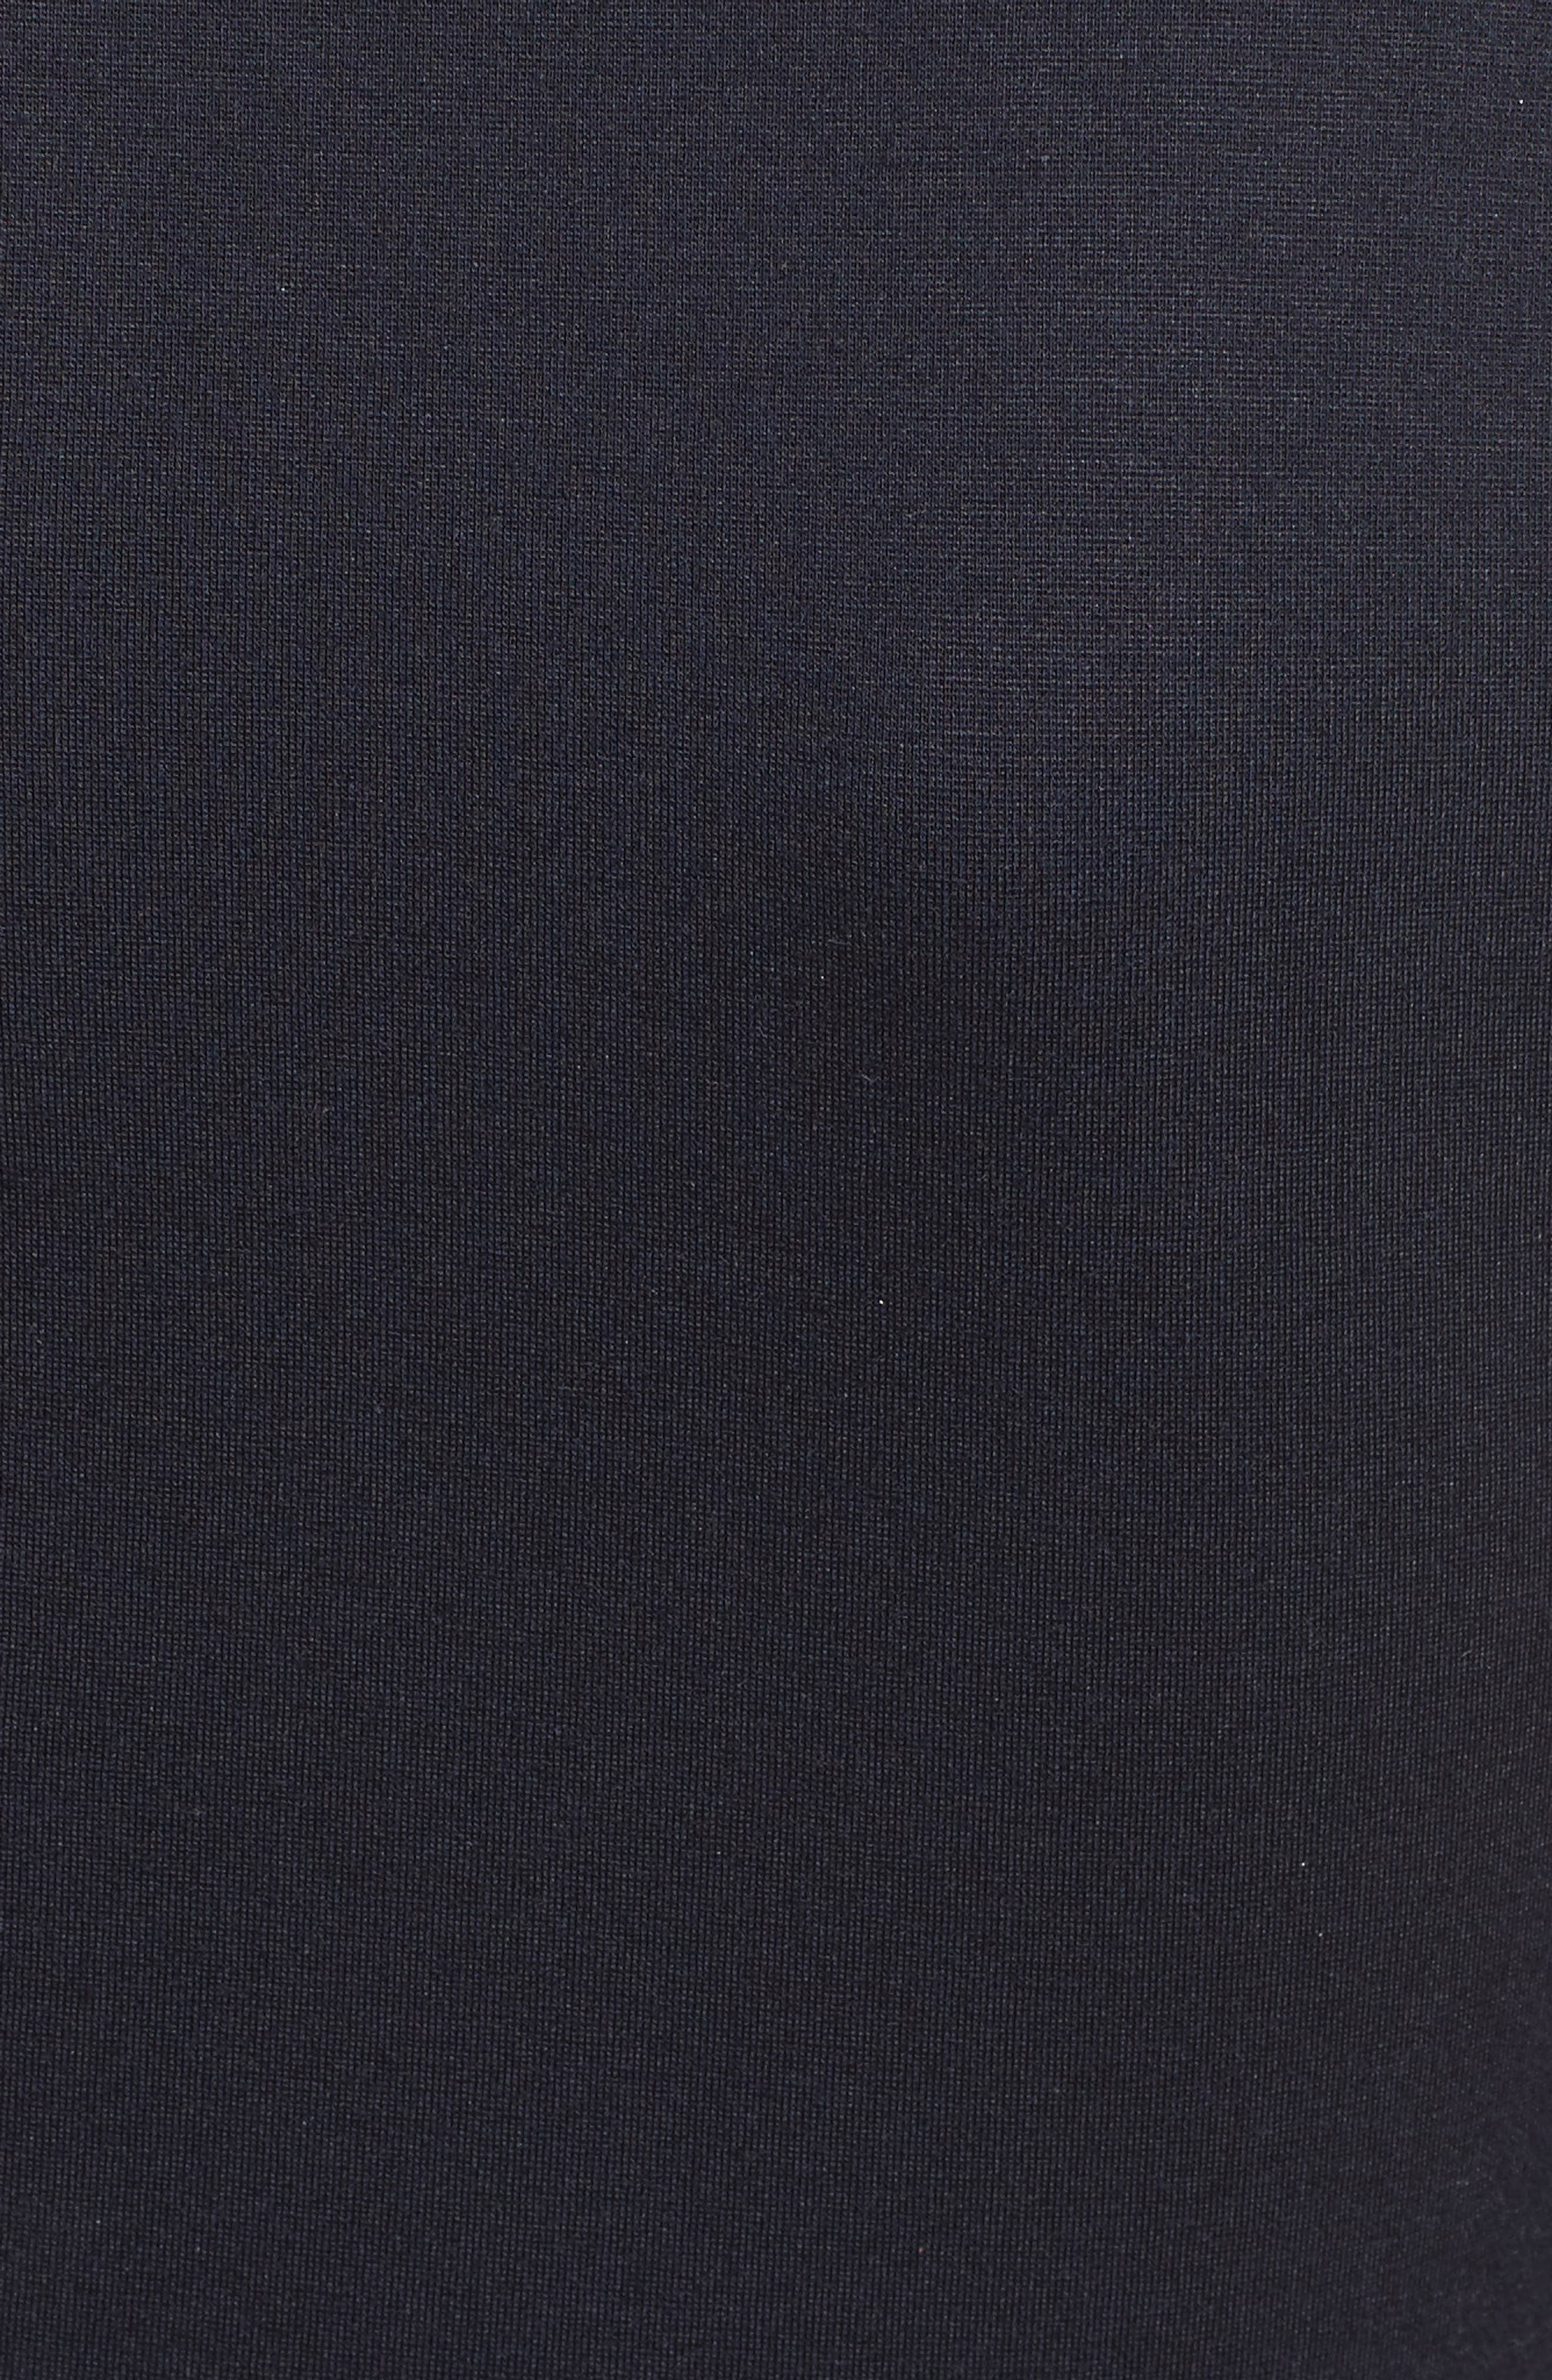 TED BAKER LONDON, Verony Eyelet Fit & Flare Dress, Alternate thumbnail 5, color, 402